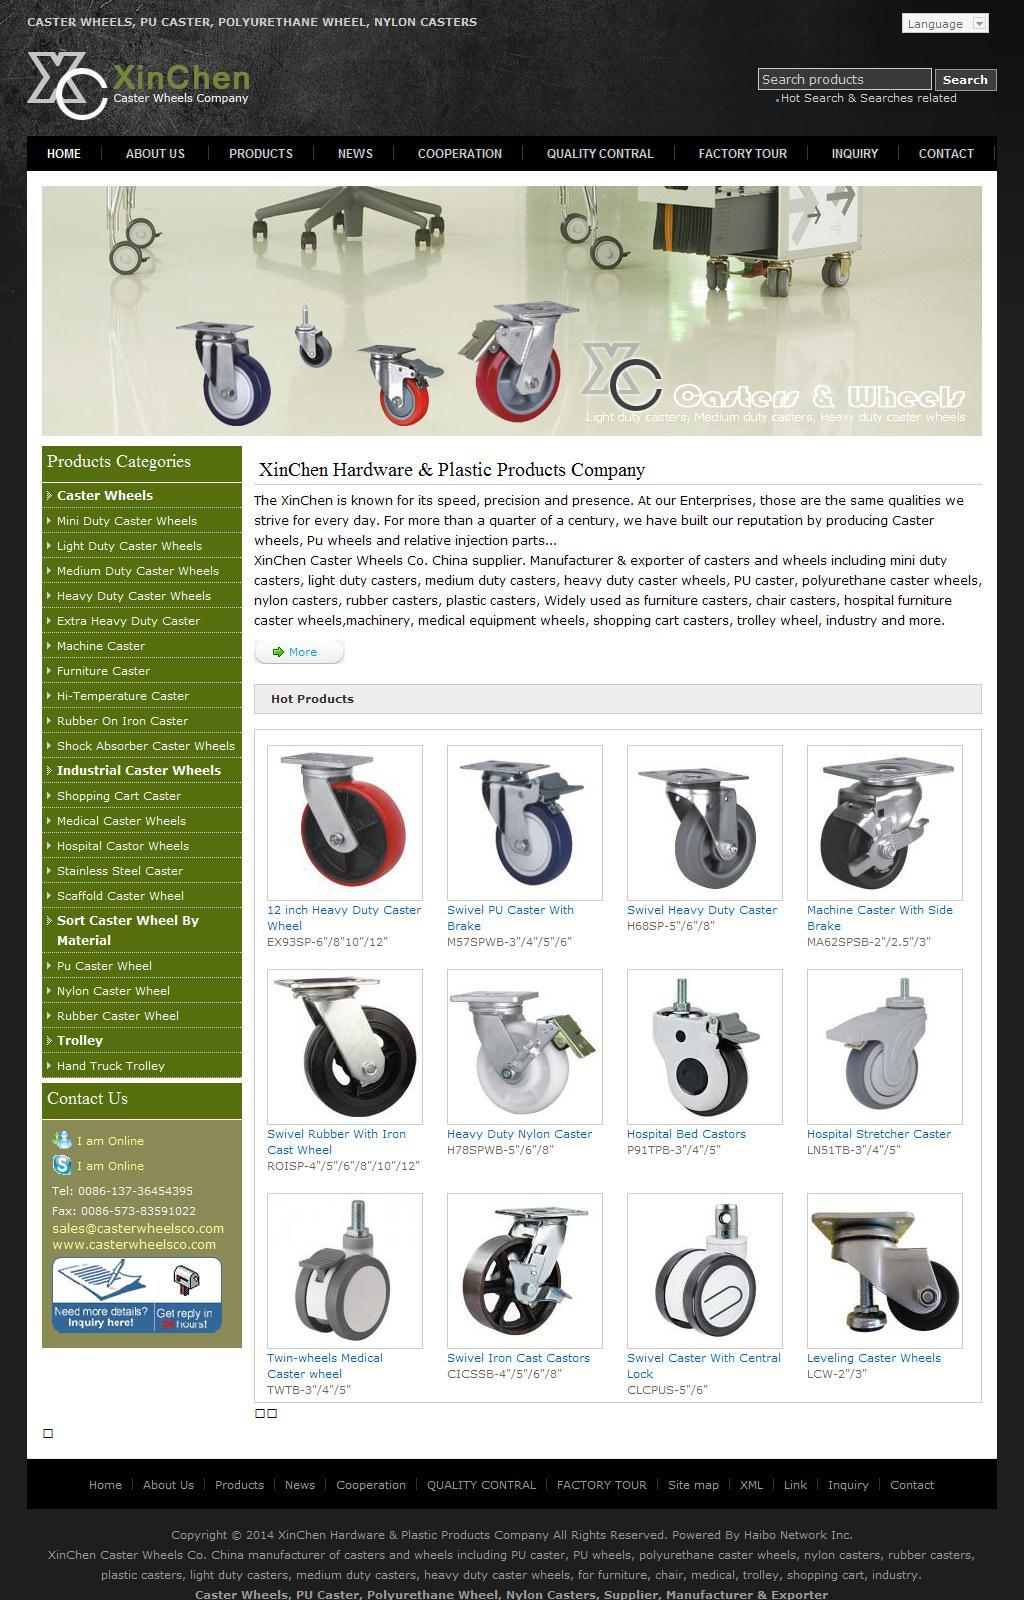 Caster Wheels, PU Caster, Polyurethane Wheel, Nylon Casters, Manufacturer, China | XinChen Caster Wheels